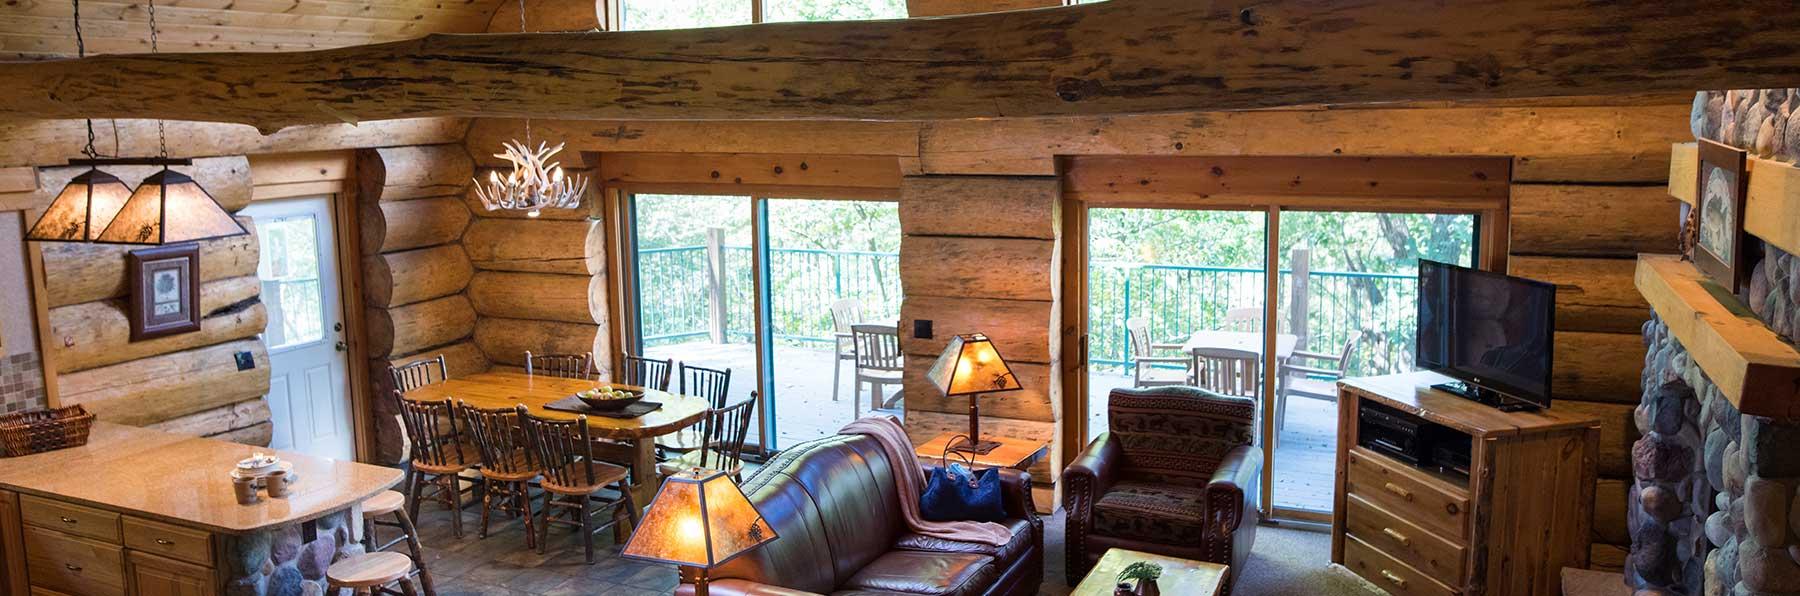 Pleasing 5 Bedroom Retreat Cabin Wilderness Resort Wisconsin Dells Interior Design Ideas Oteneahmetsinanyavuzinfo